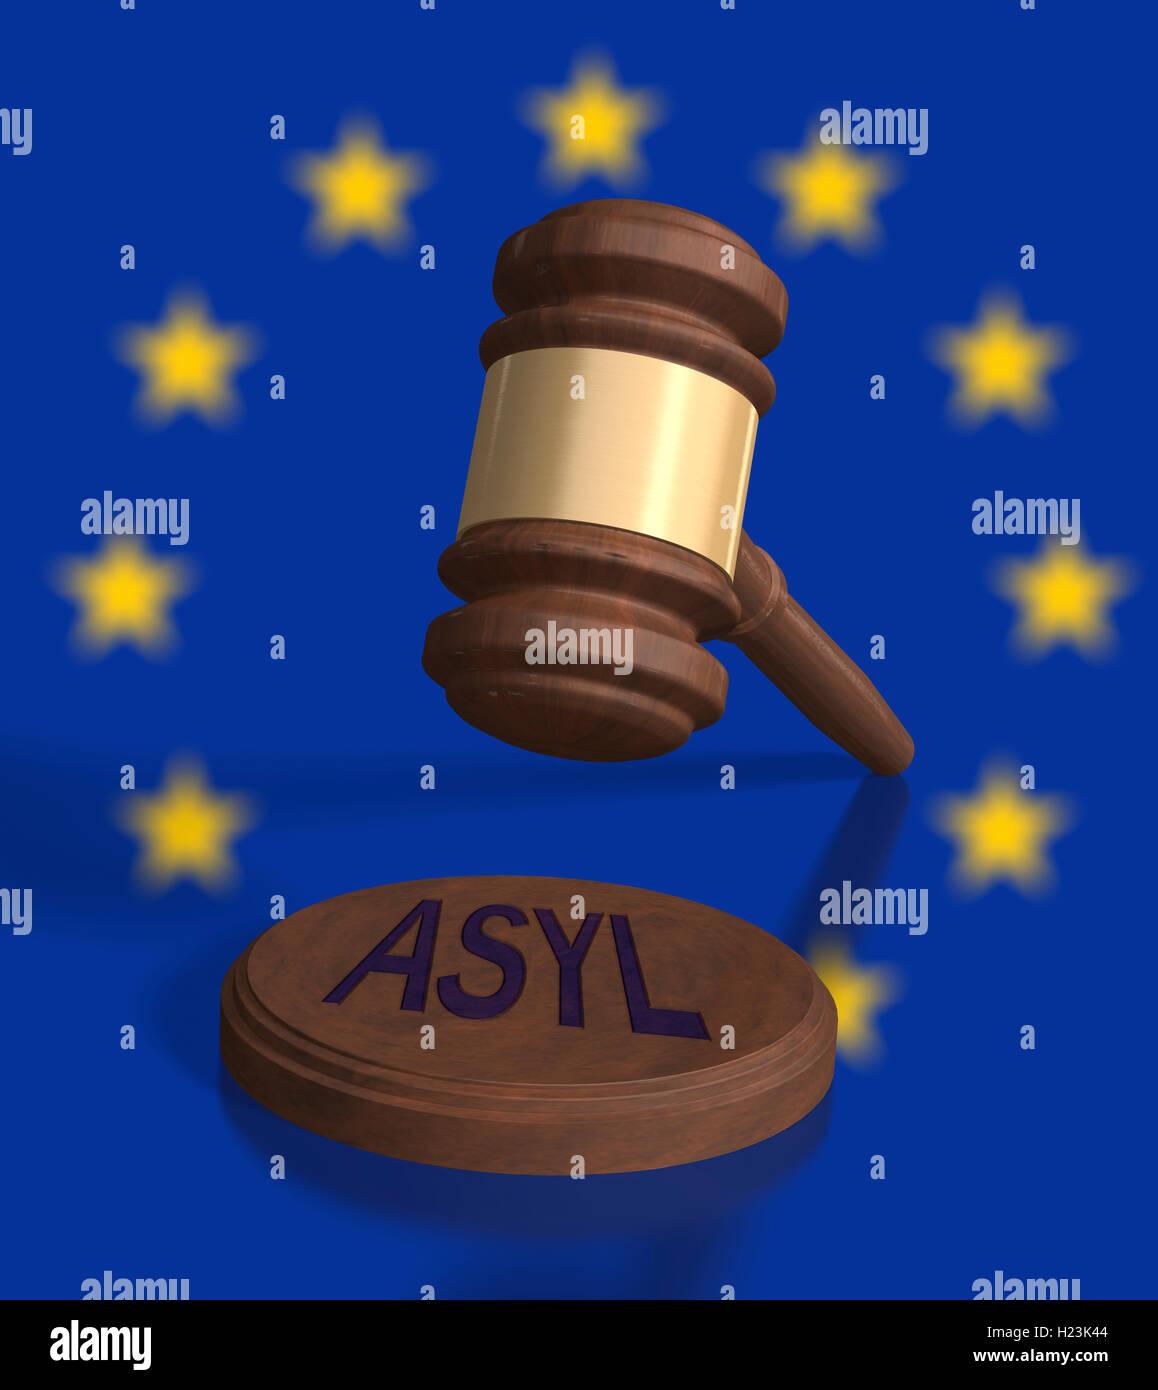 Gavel in front of EU stars, Asyl, asylum written on block - Stock Image